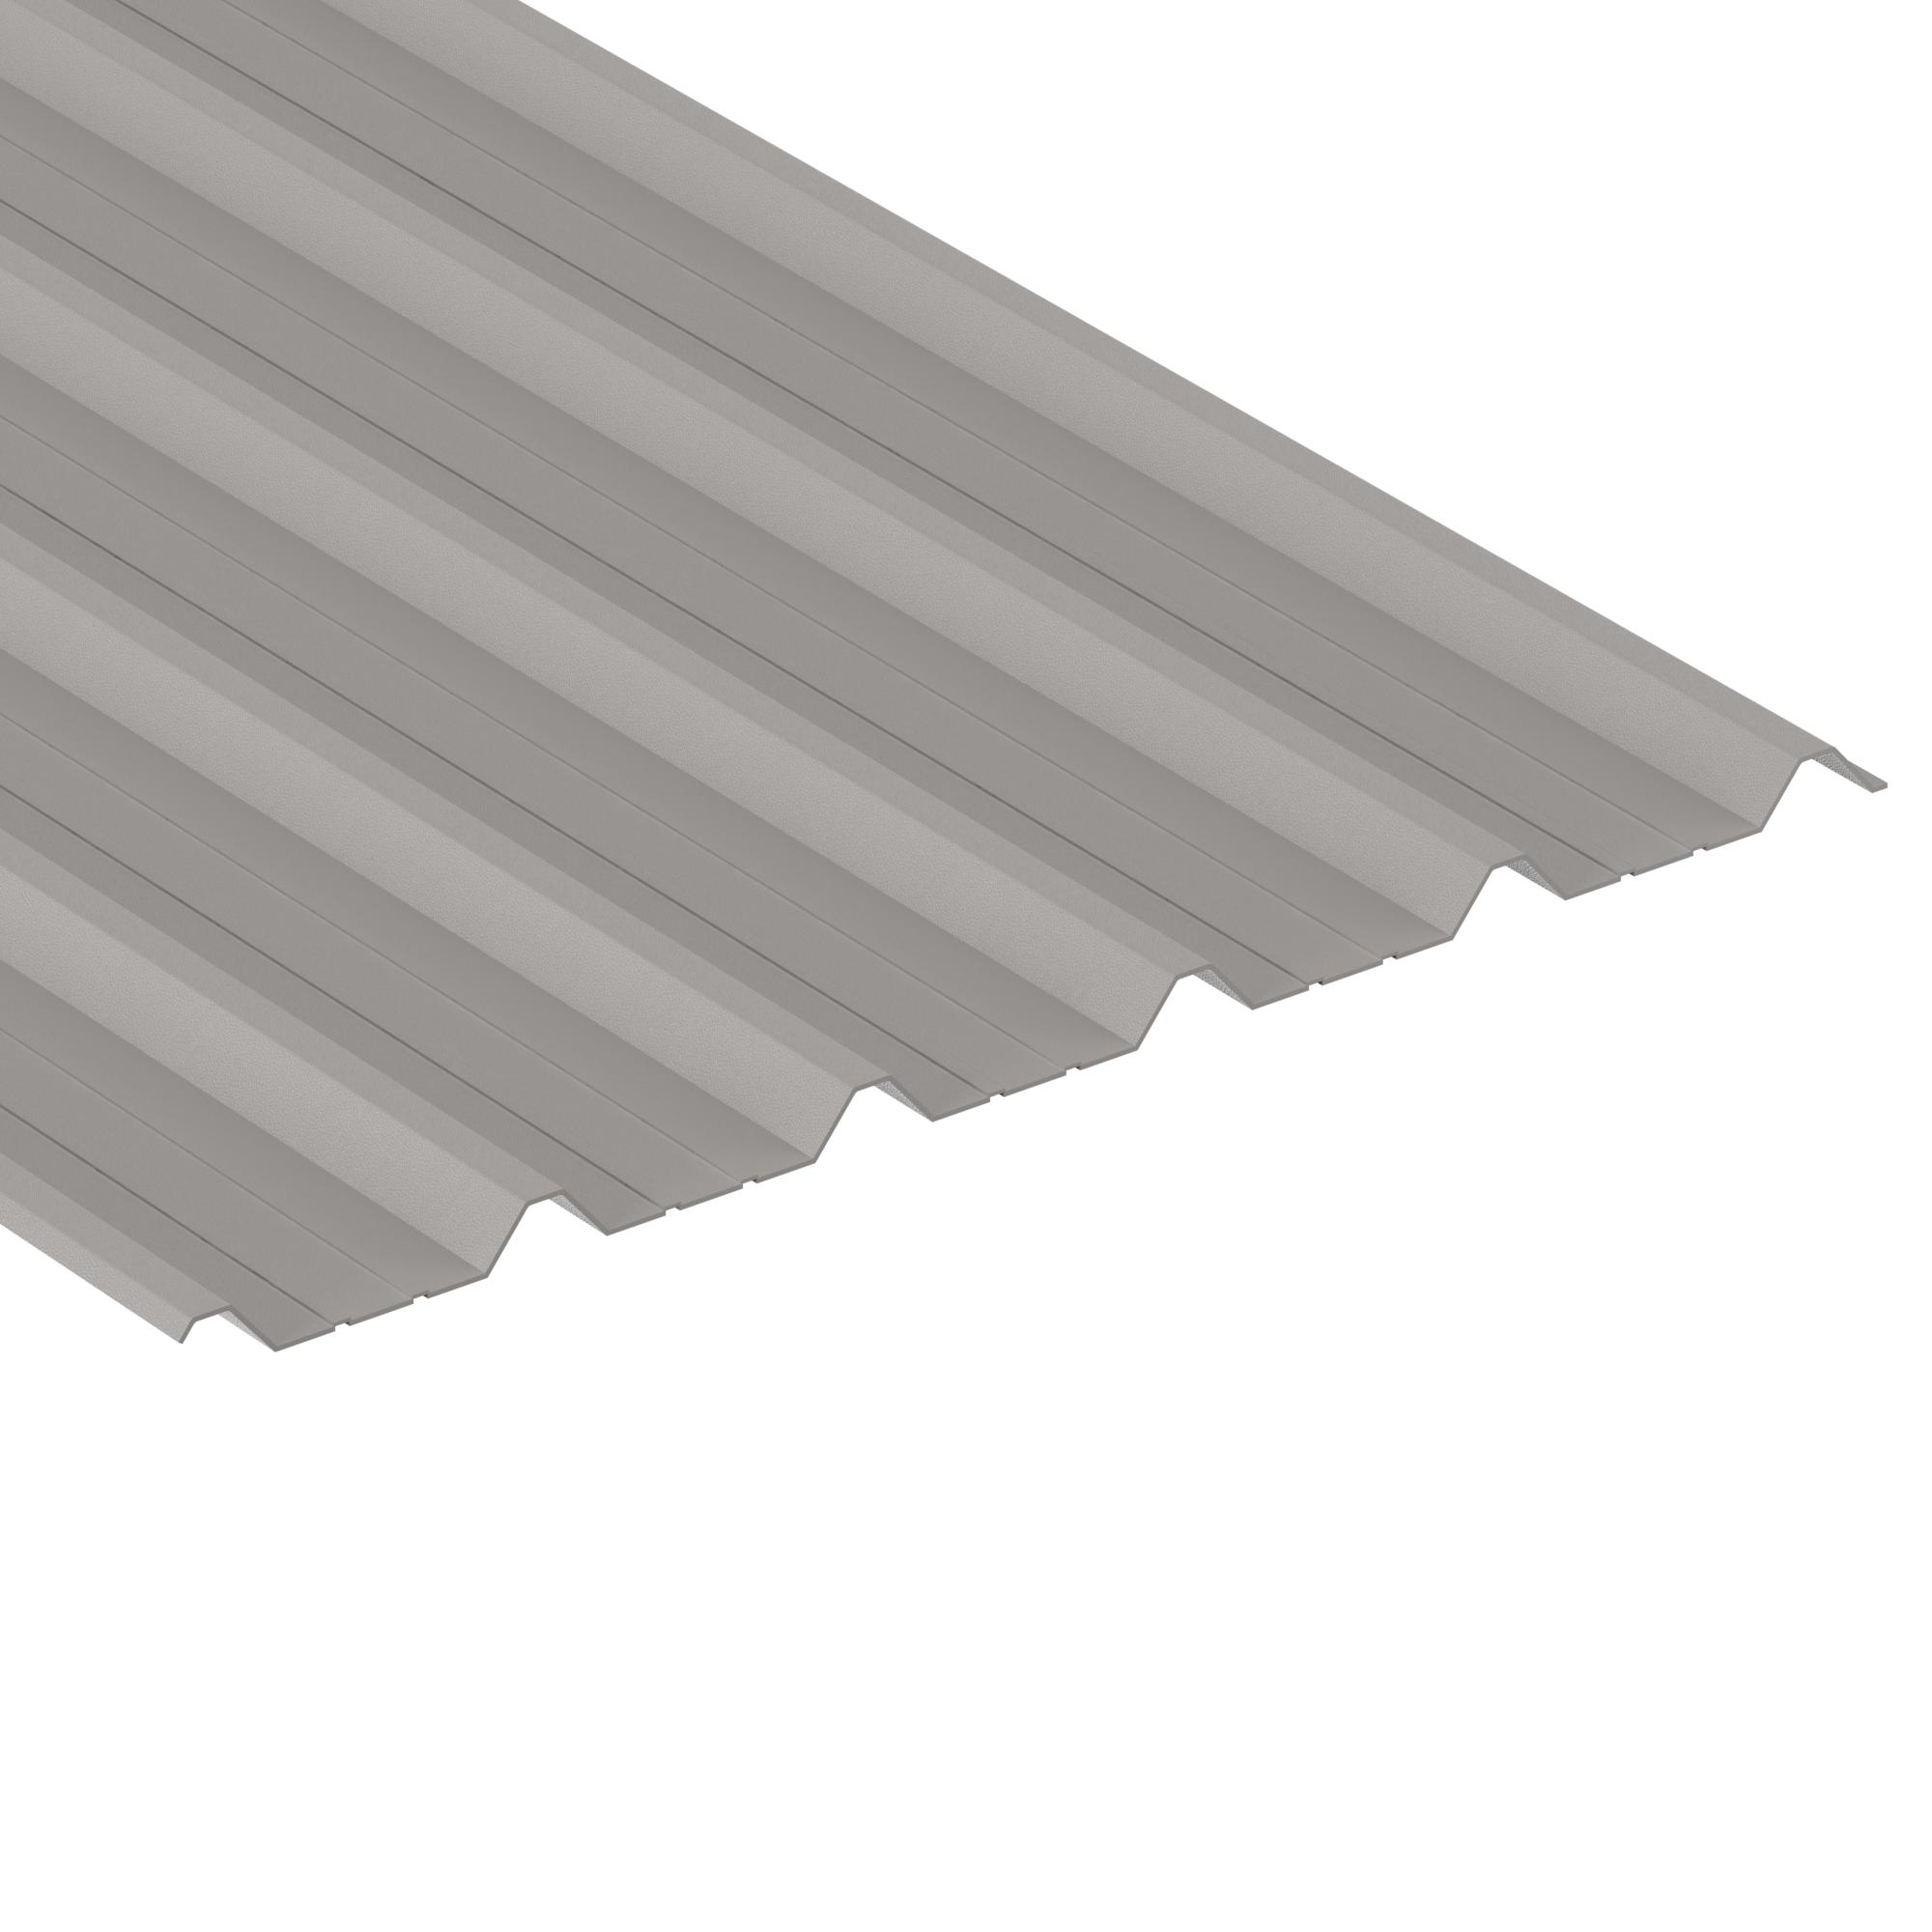 Goosewing Grey Plastic Coated steel sheet